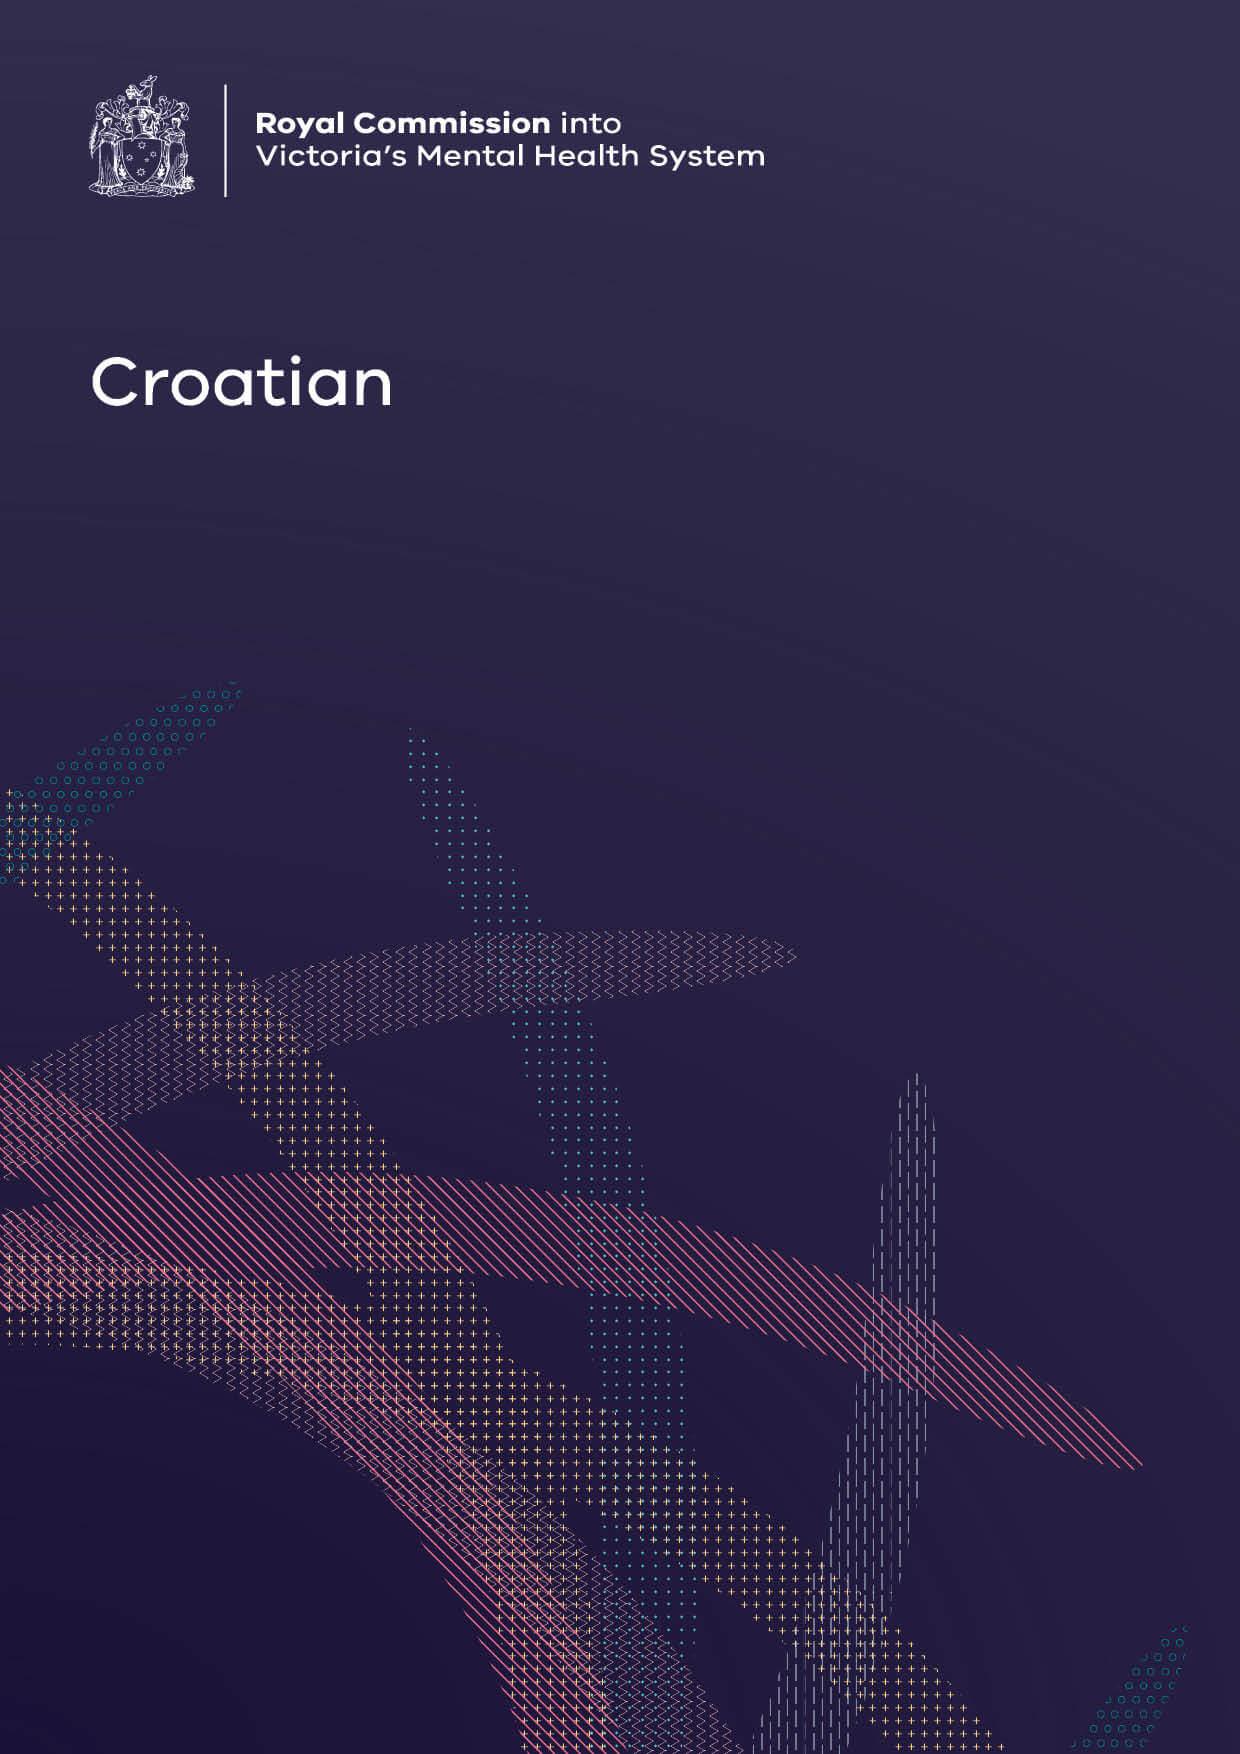 RCVMHS_FinalReport_Covers_Croatian